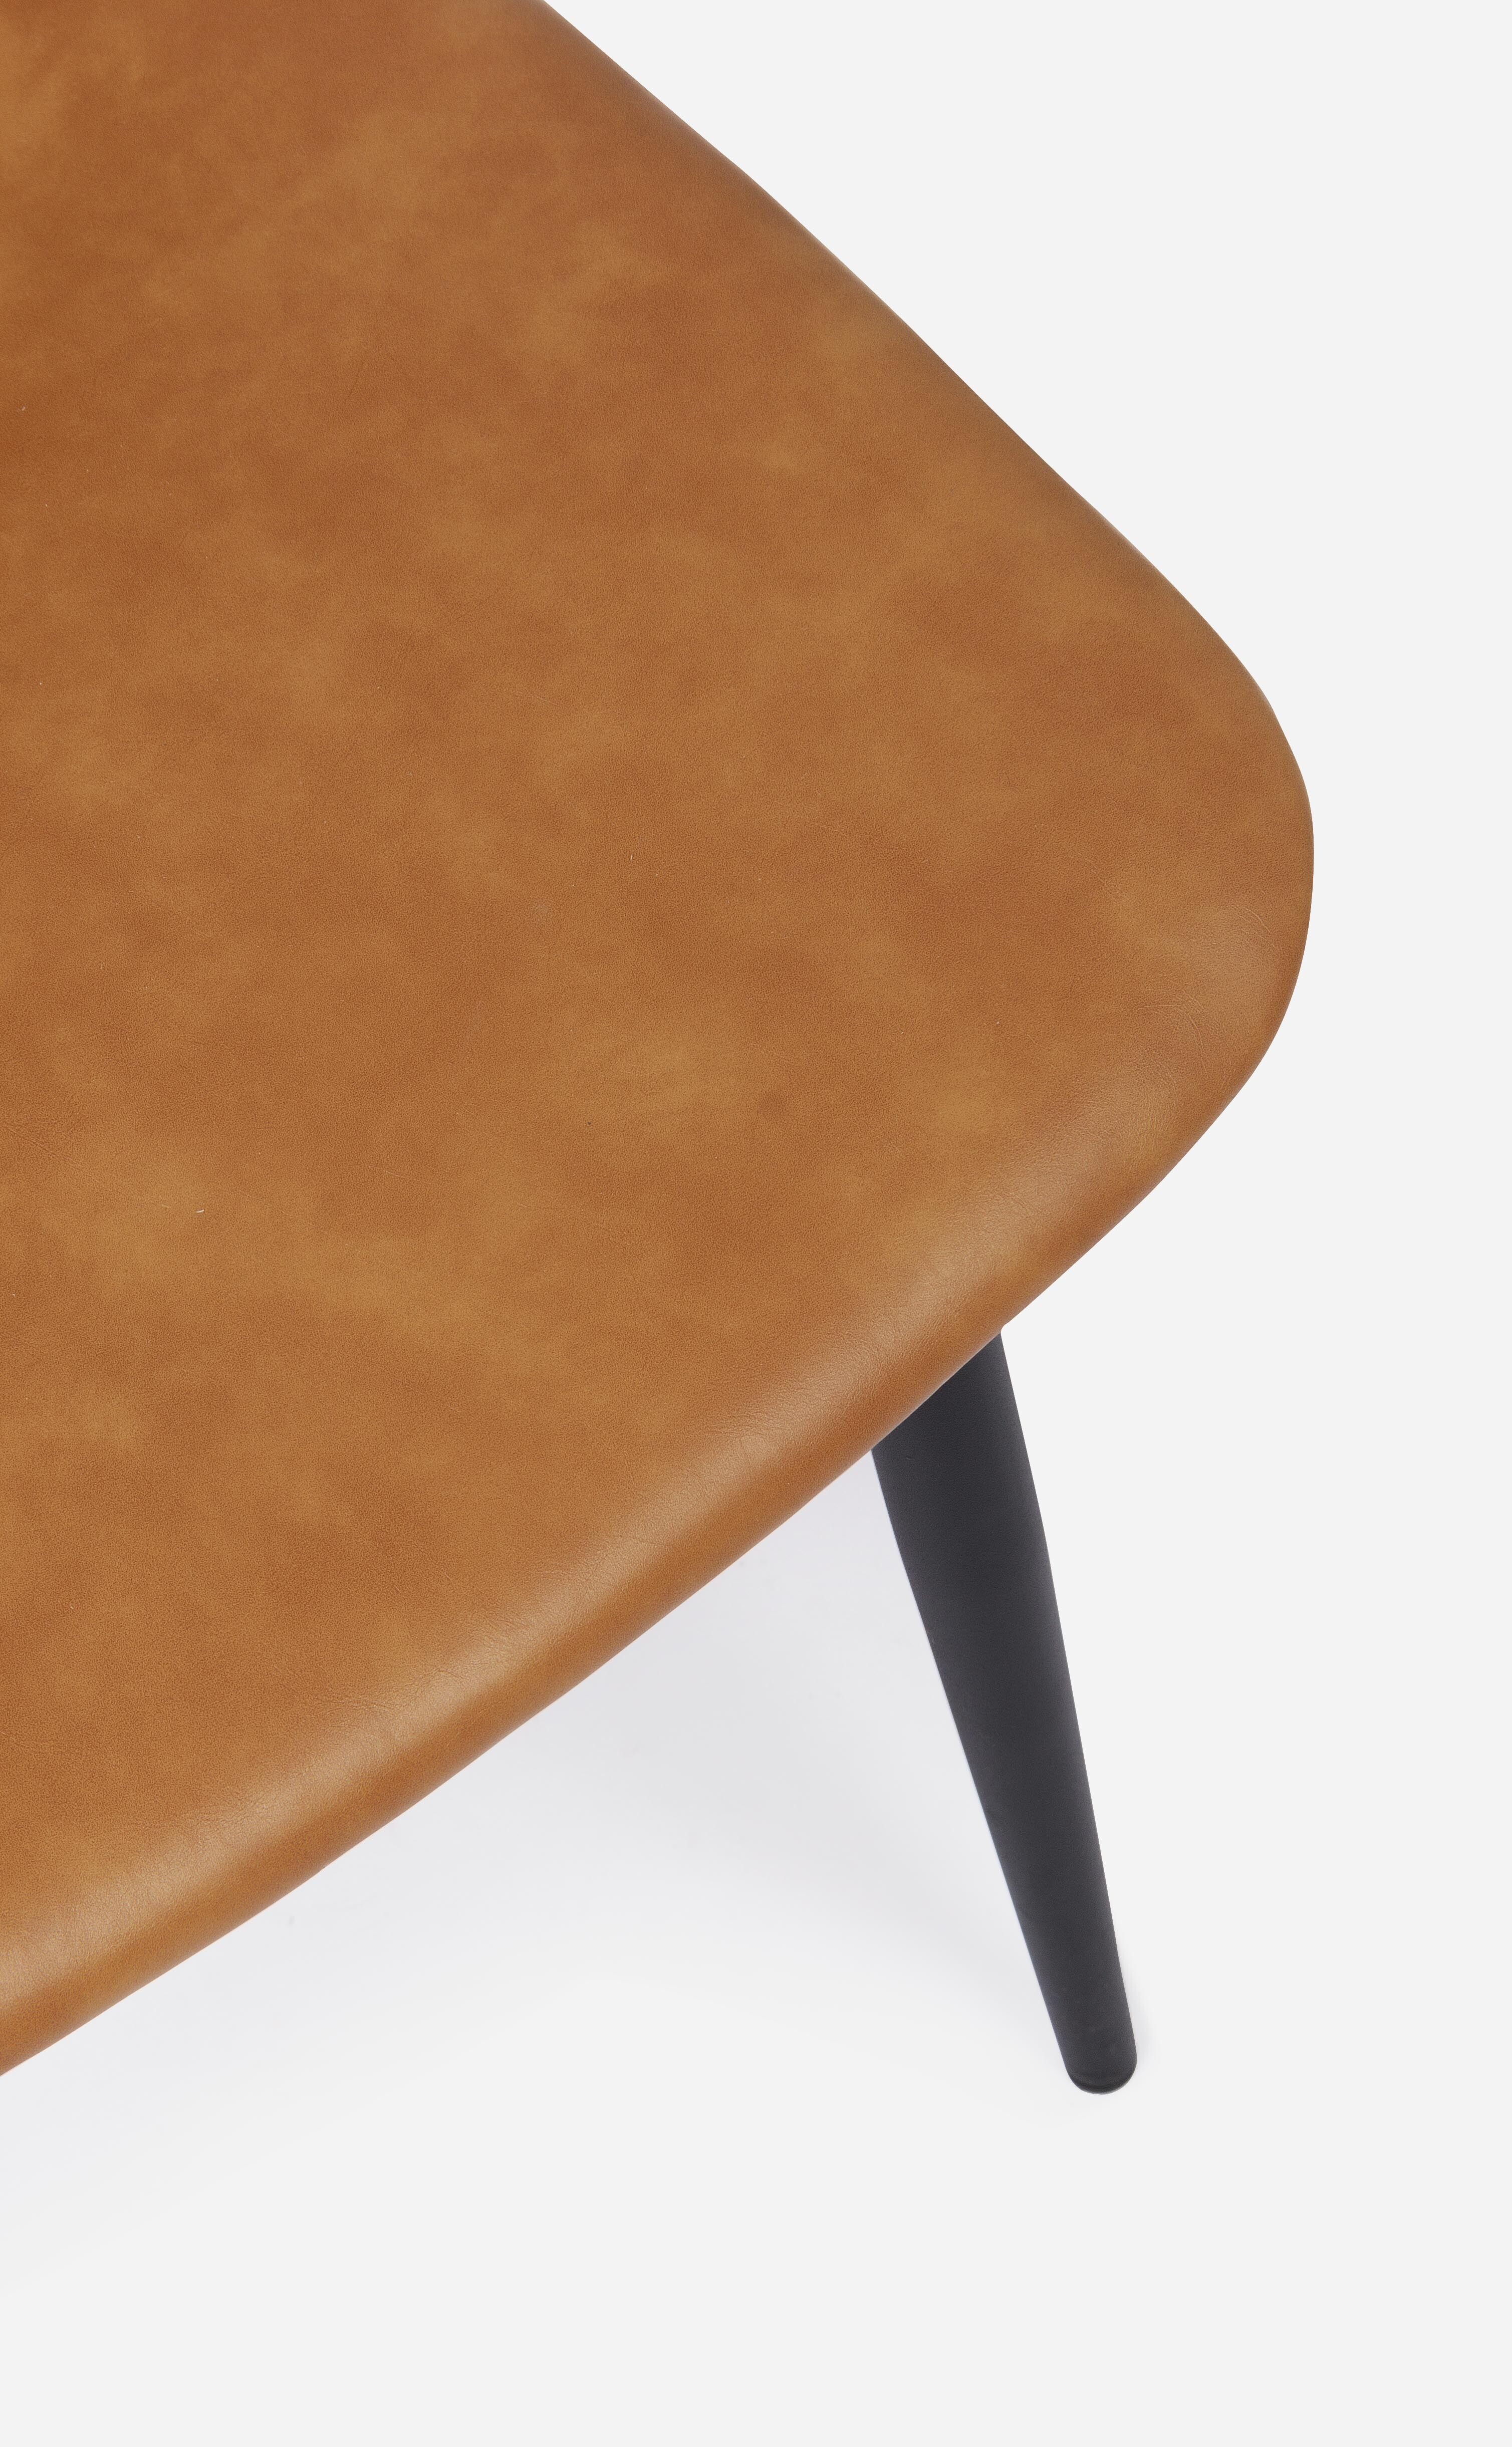 6 Stühle Kyra Pu  03